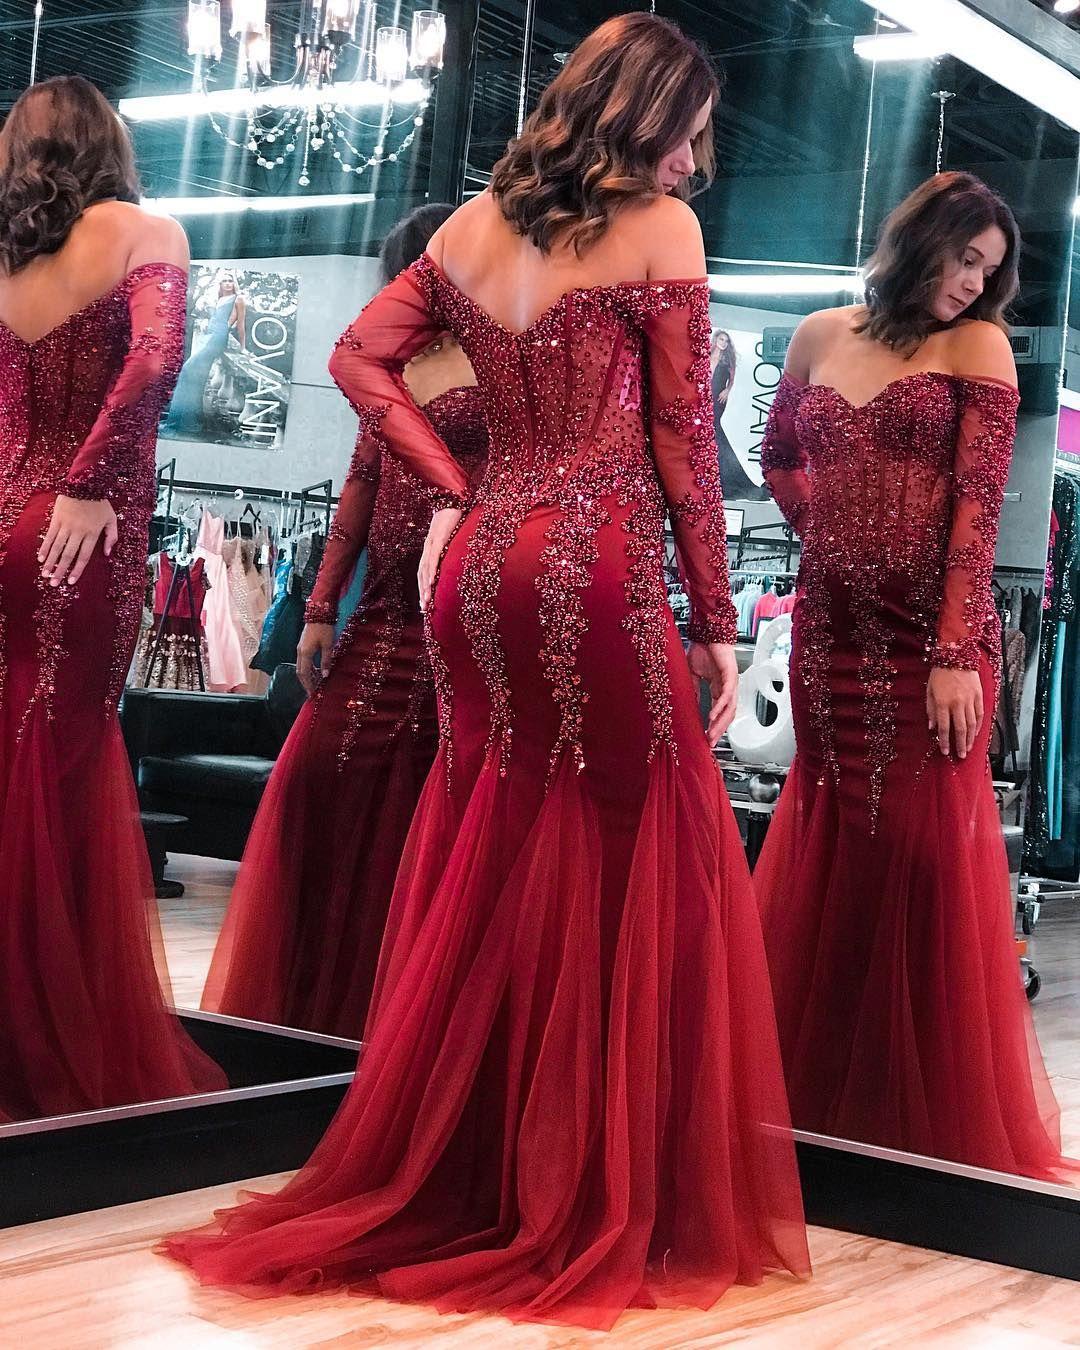 Best Prom Dresses 2021 Dark Red Mermaid 2021 Prom Dresses Gorgeous Crystal Beading